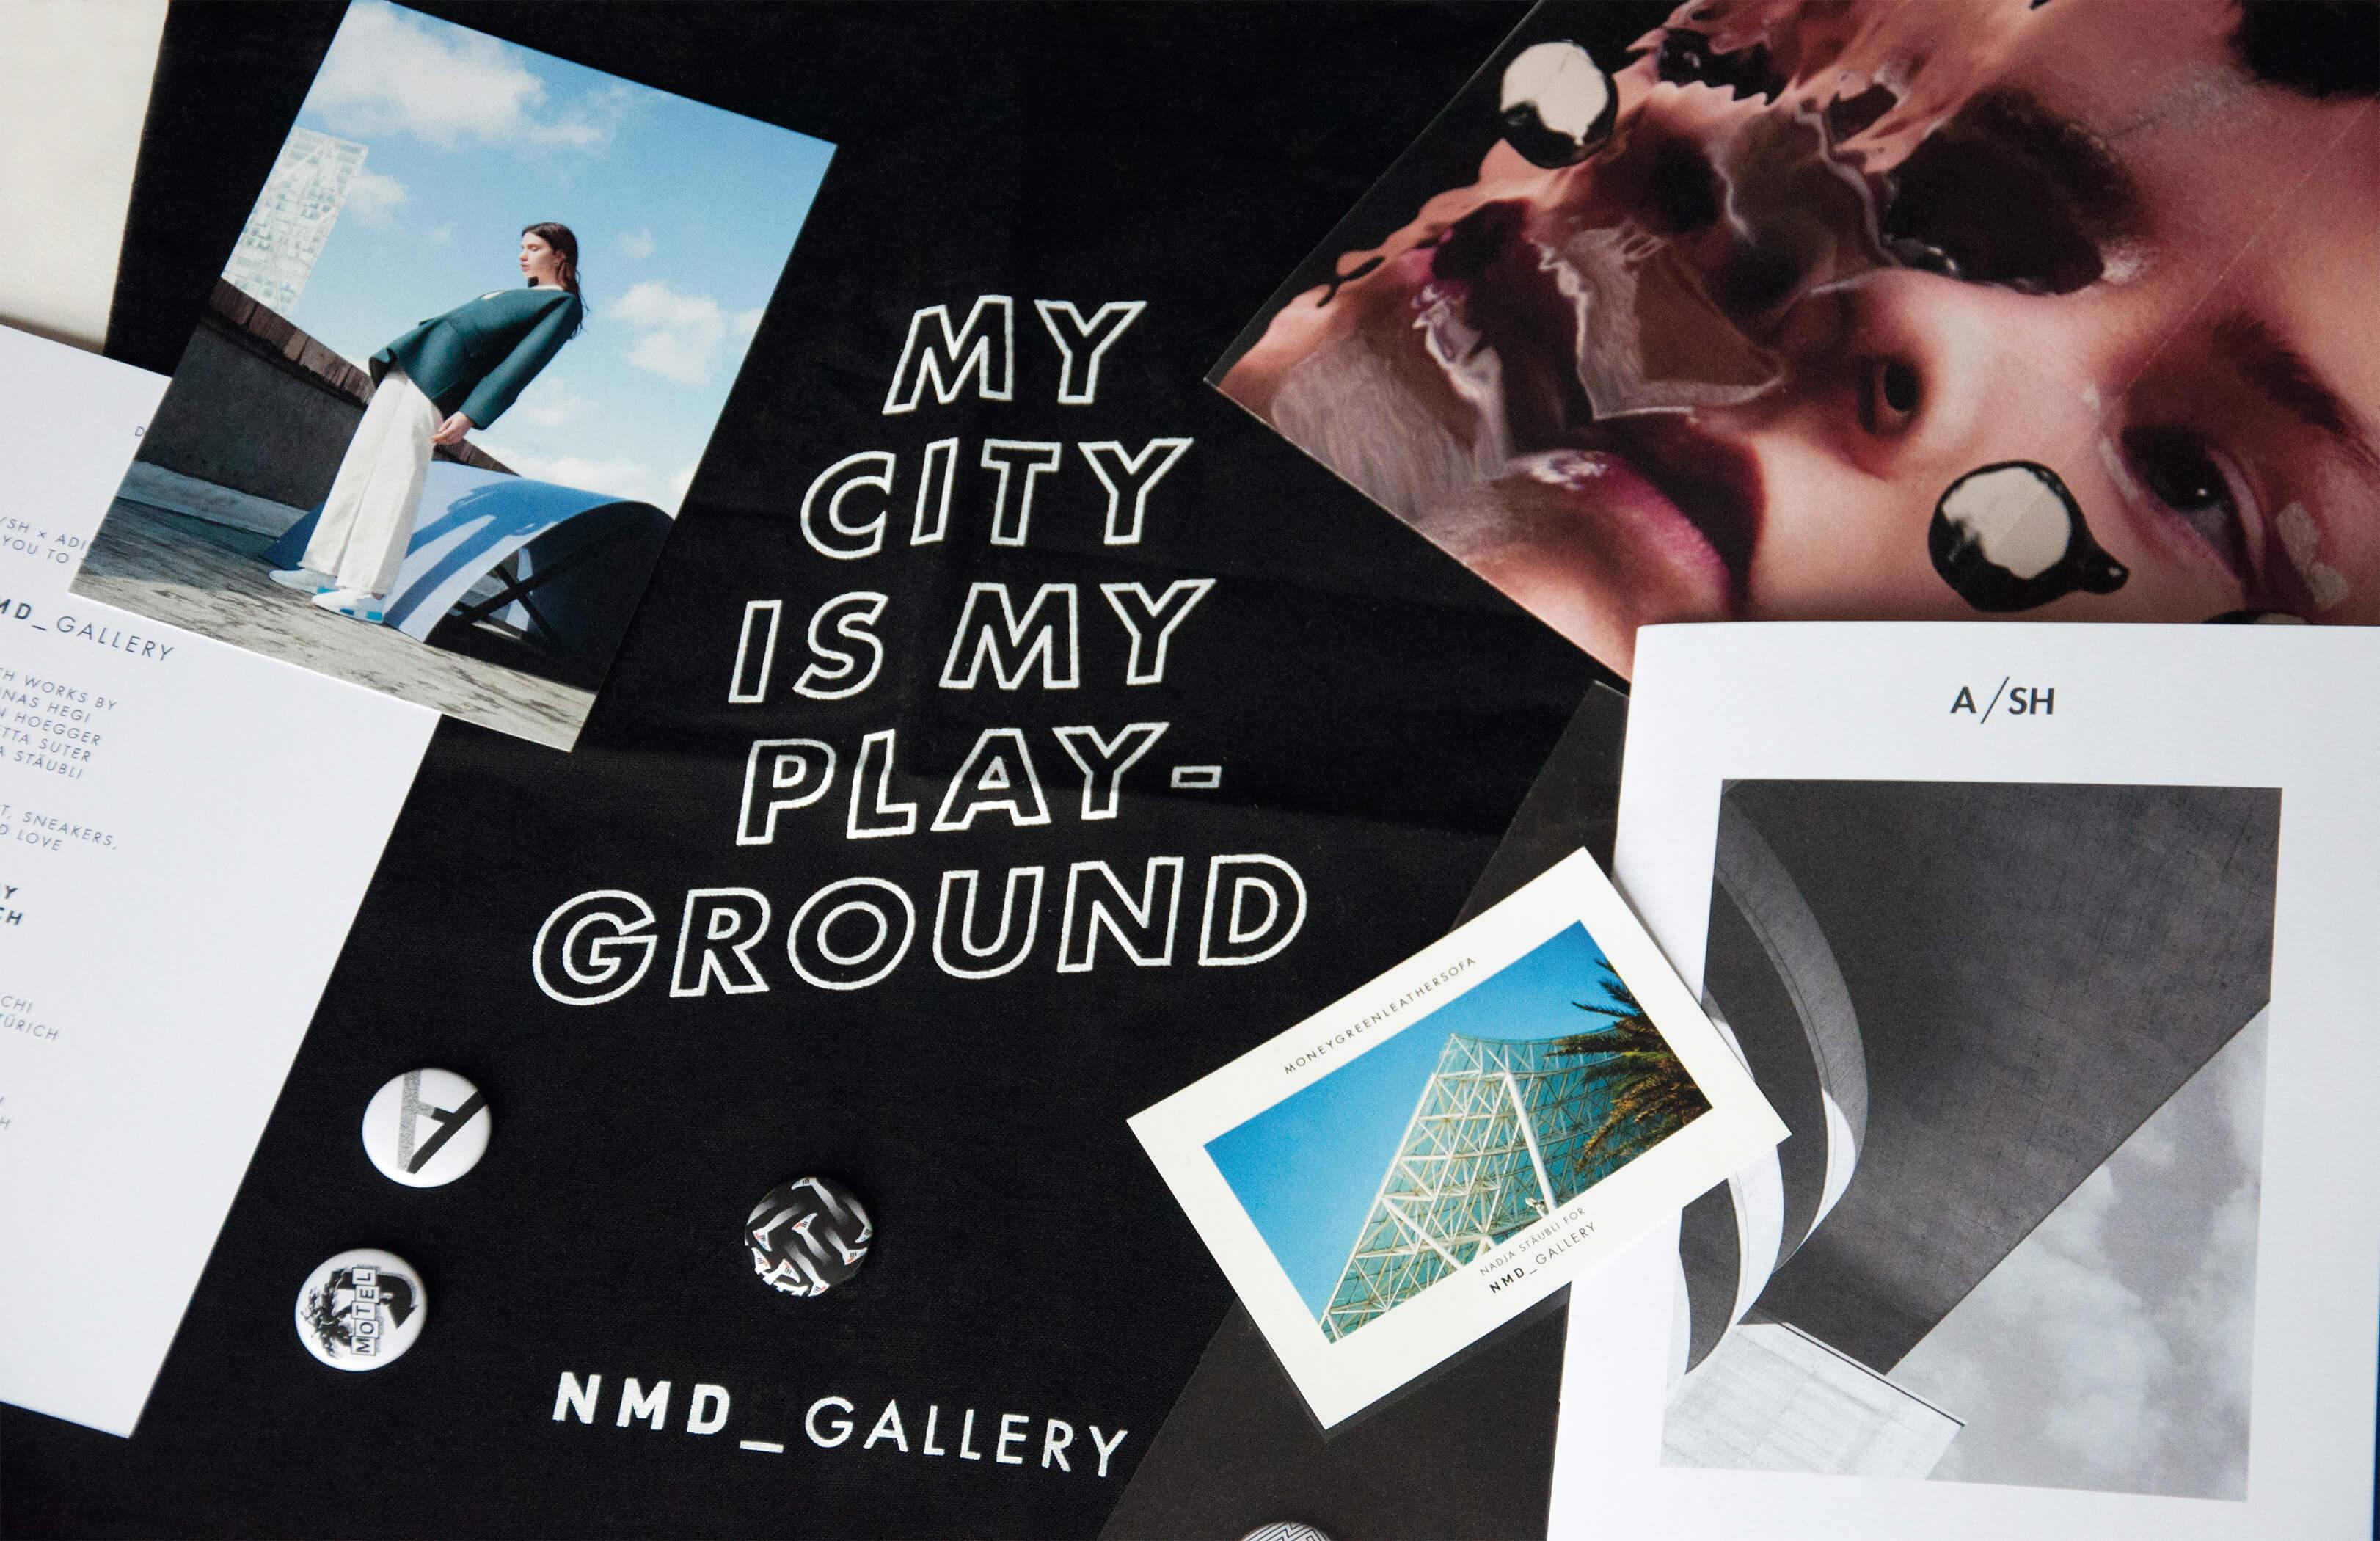 A/SH x adidas originals: NMD_Gallery